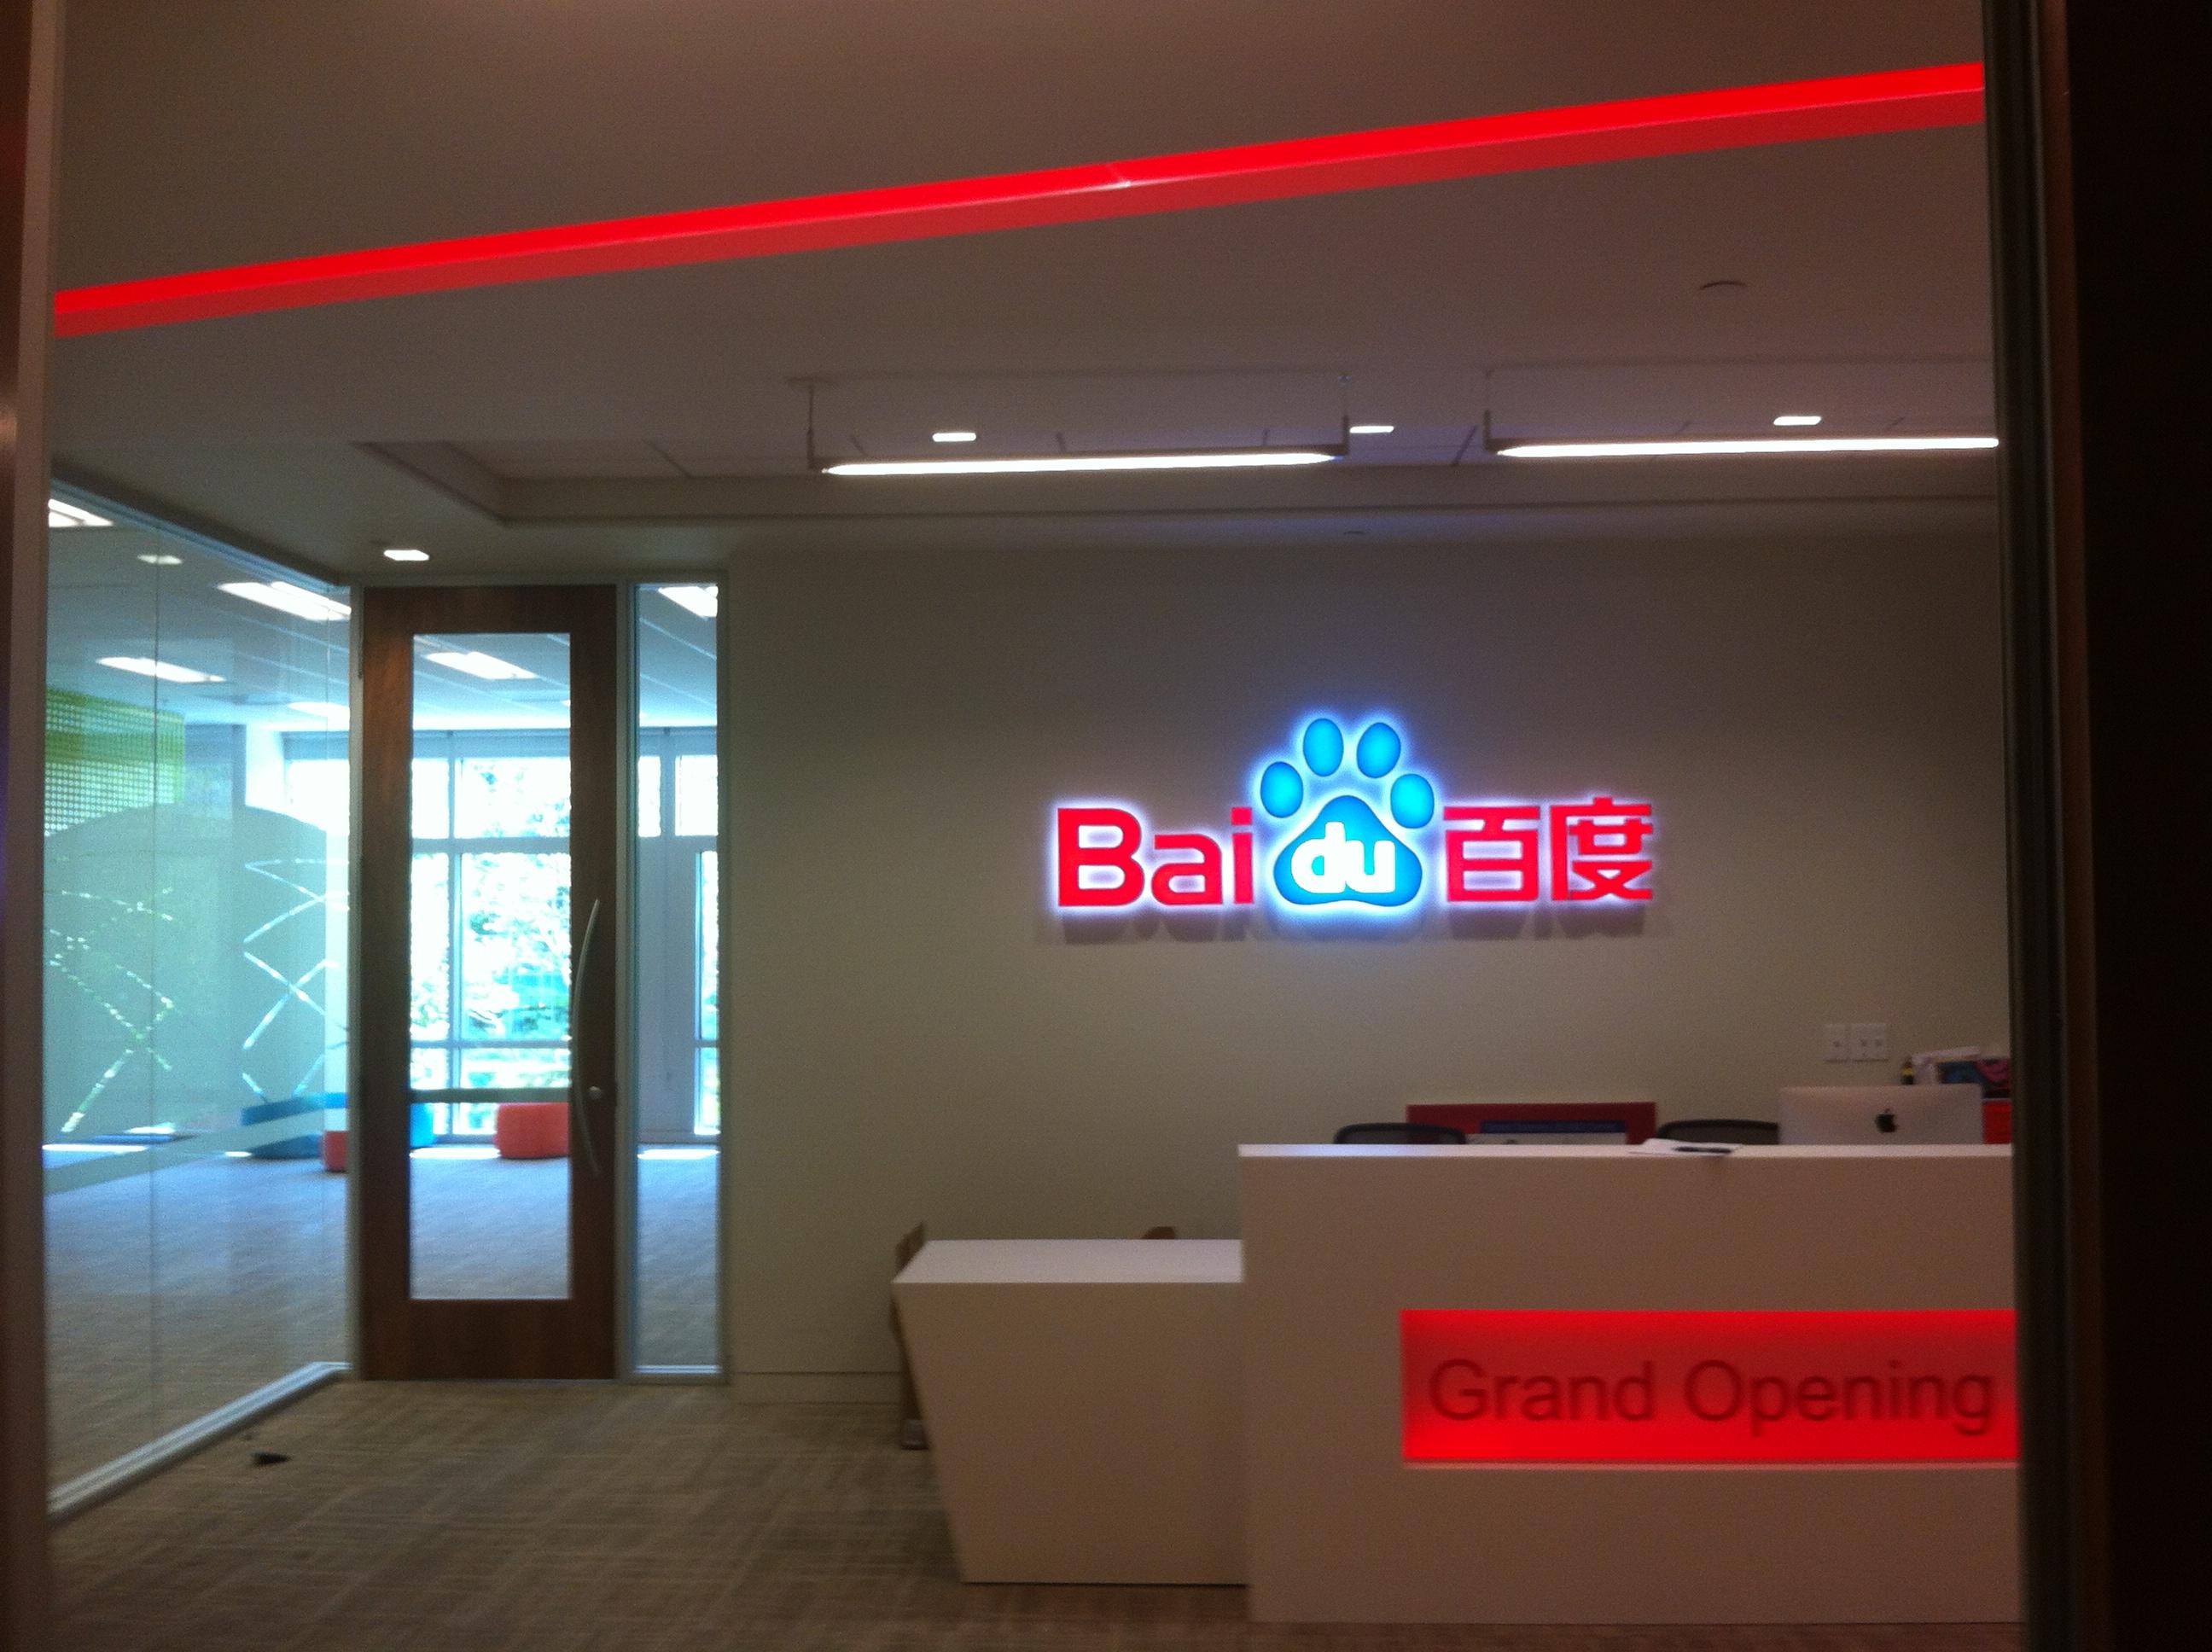 The lobby at Baidu's office in Sunnyvale, Calif.